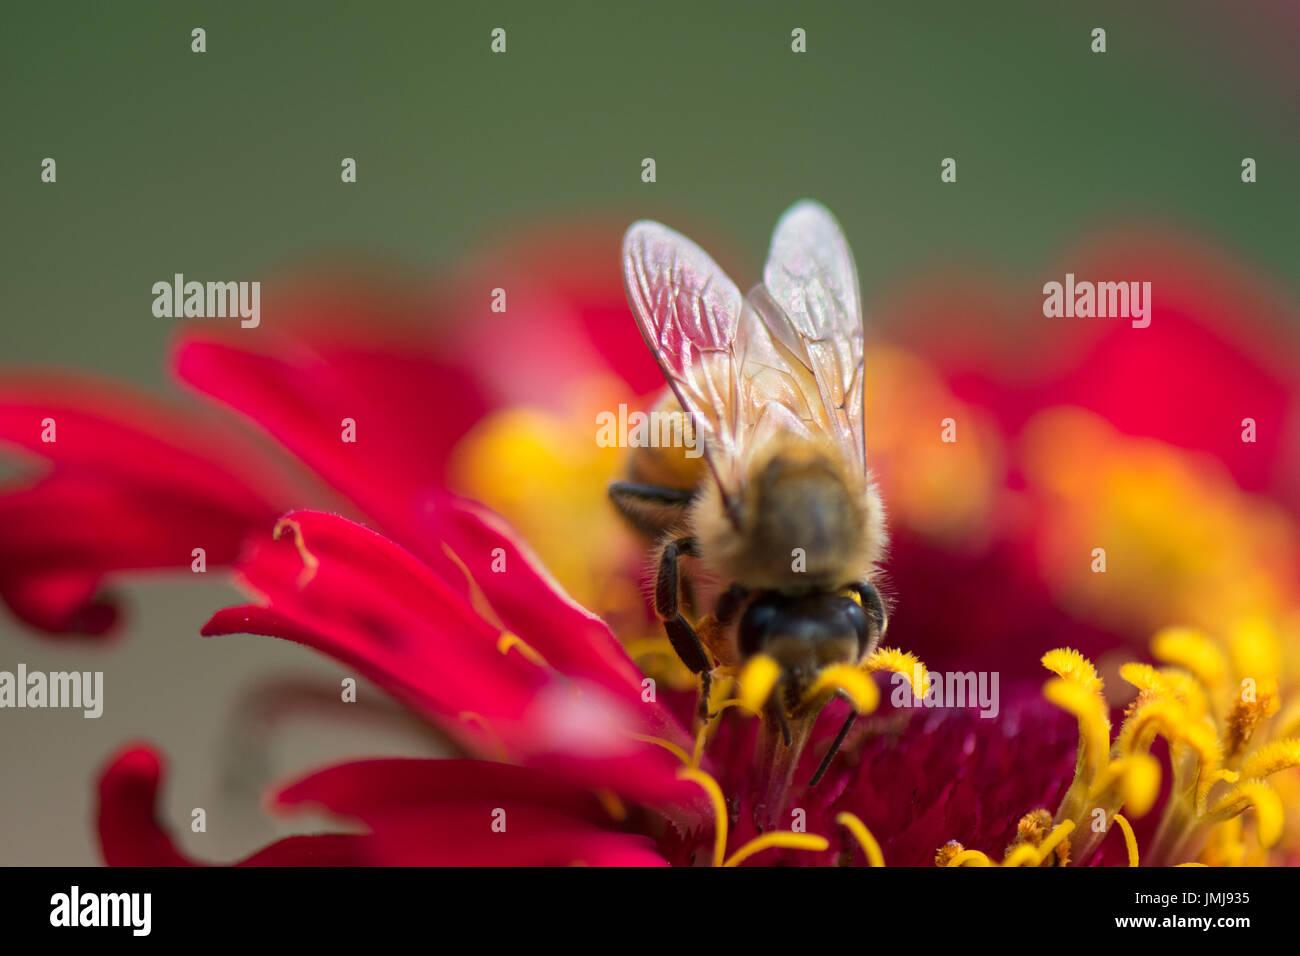 Honey bee on red zinnia flower - Stock Image